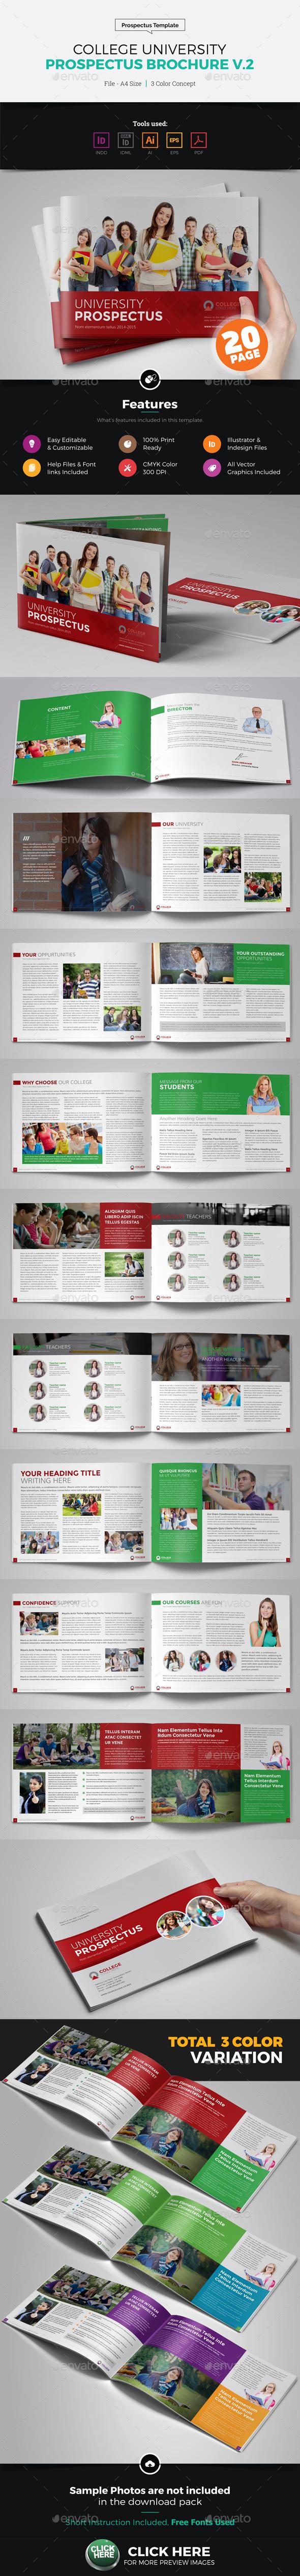 College University Prospectus Brochure v2 - Corporate Brochures